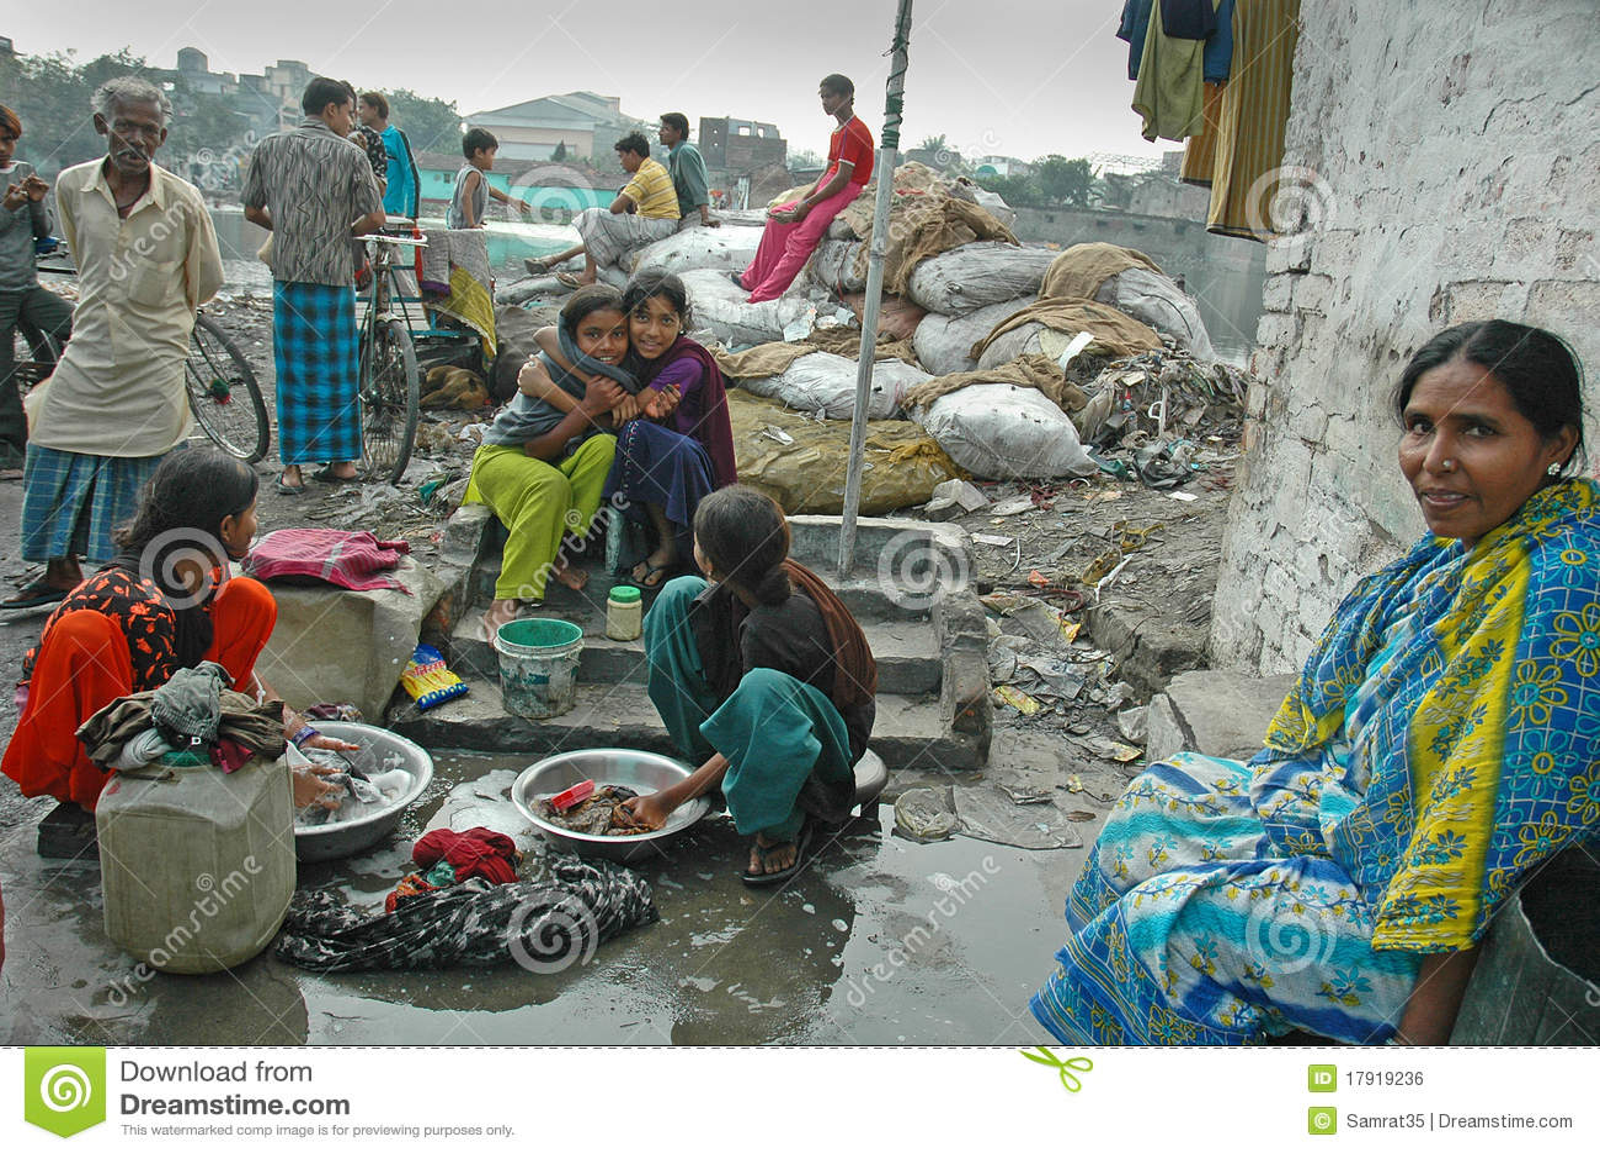 slum dwellers of kolkata-india editorial photo